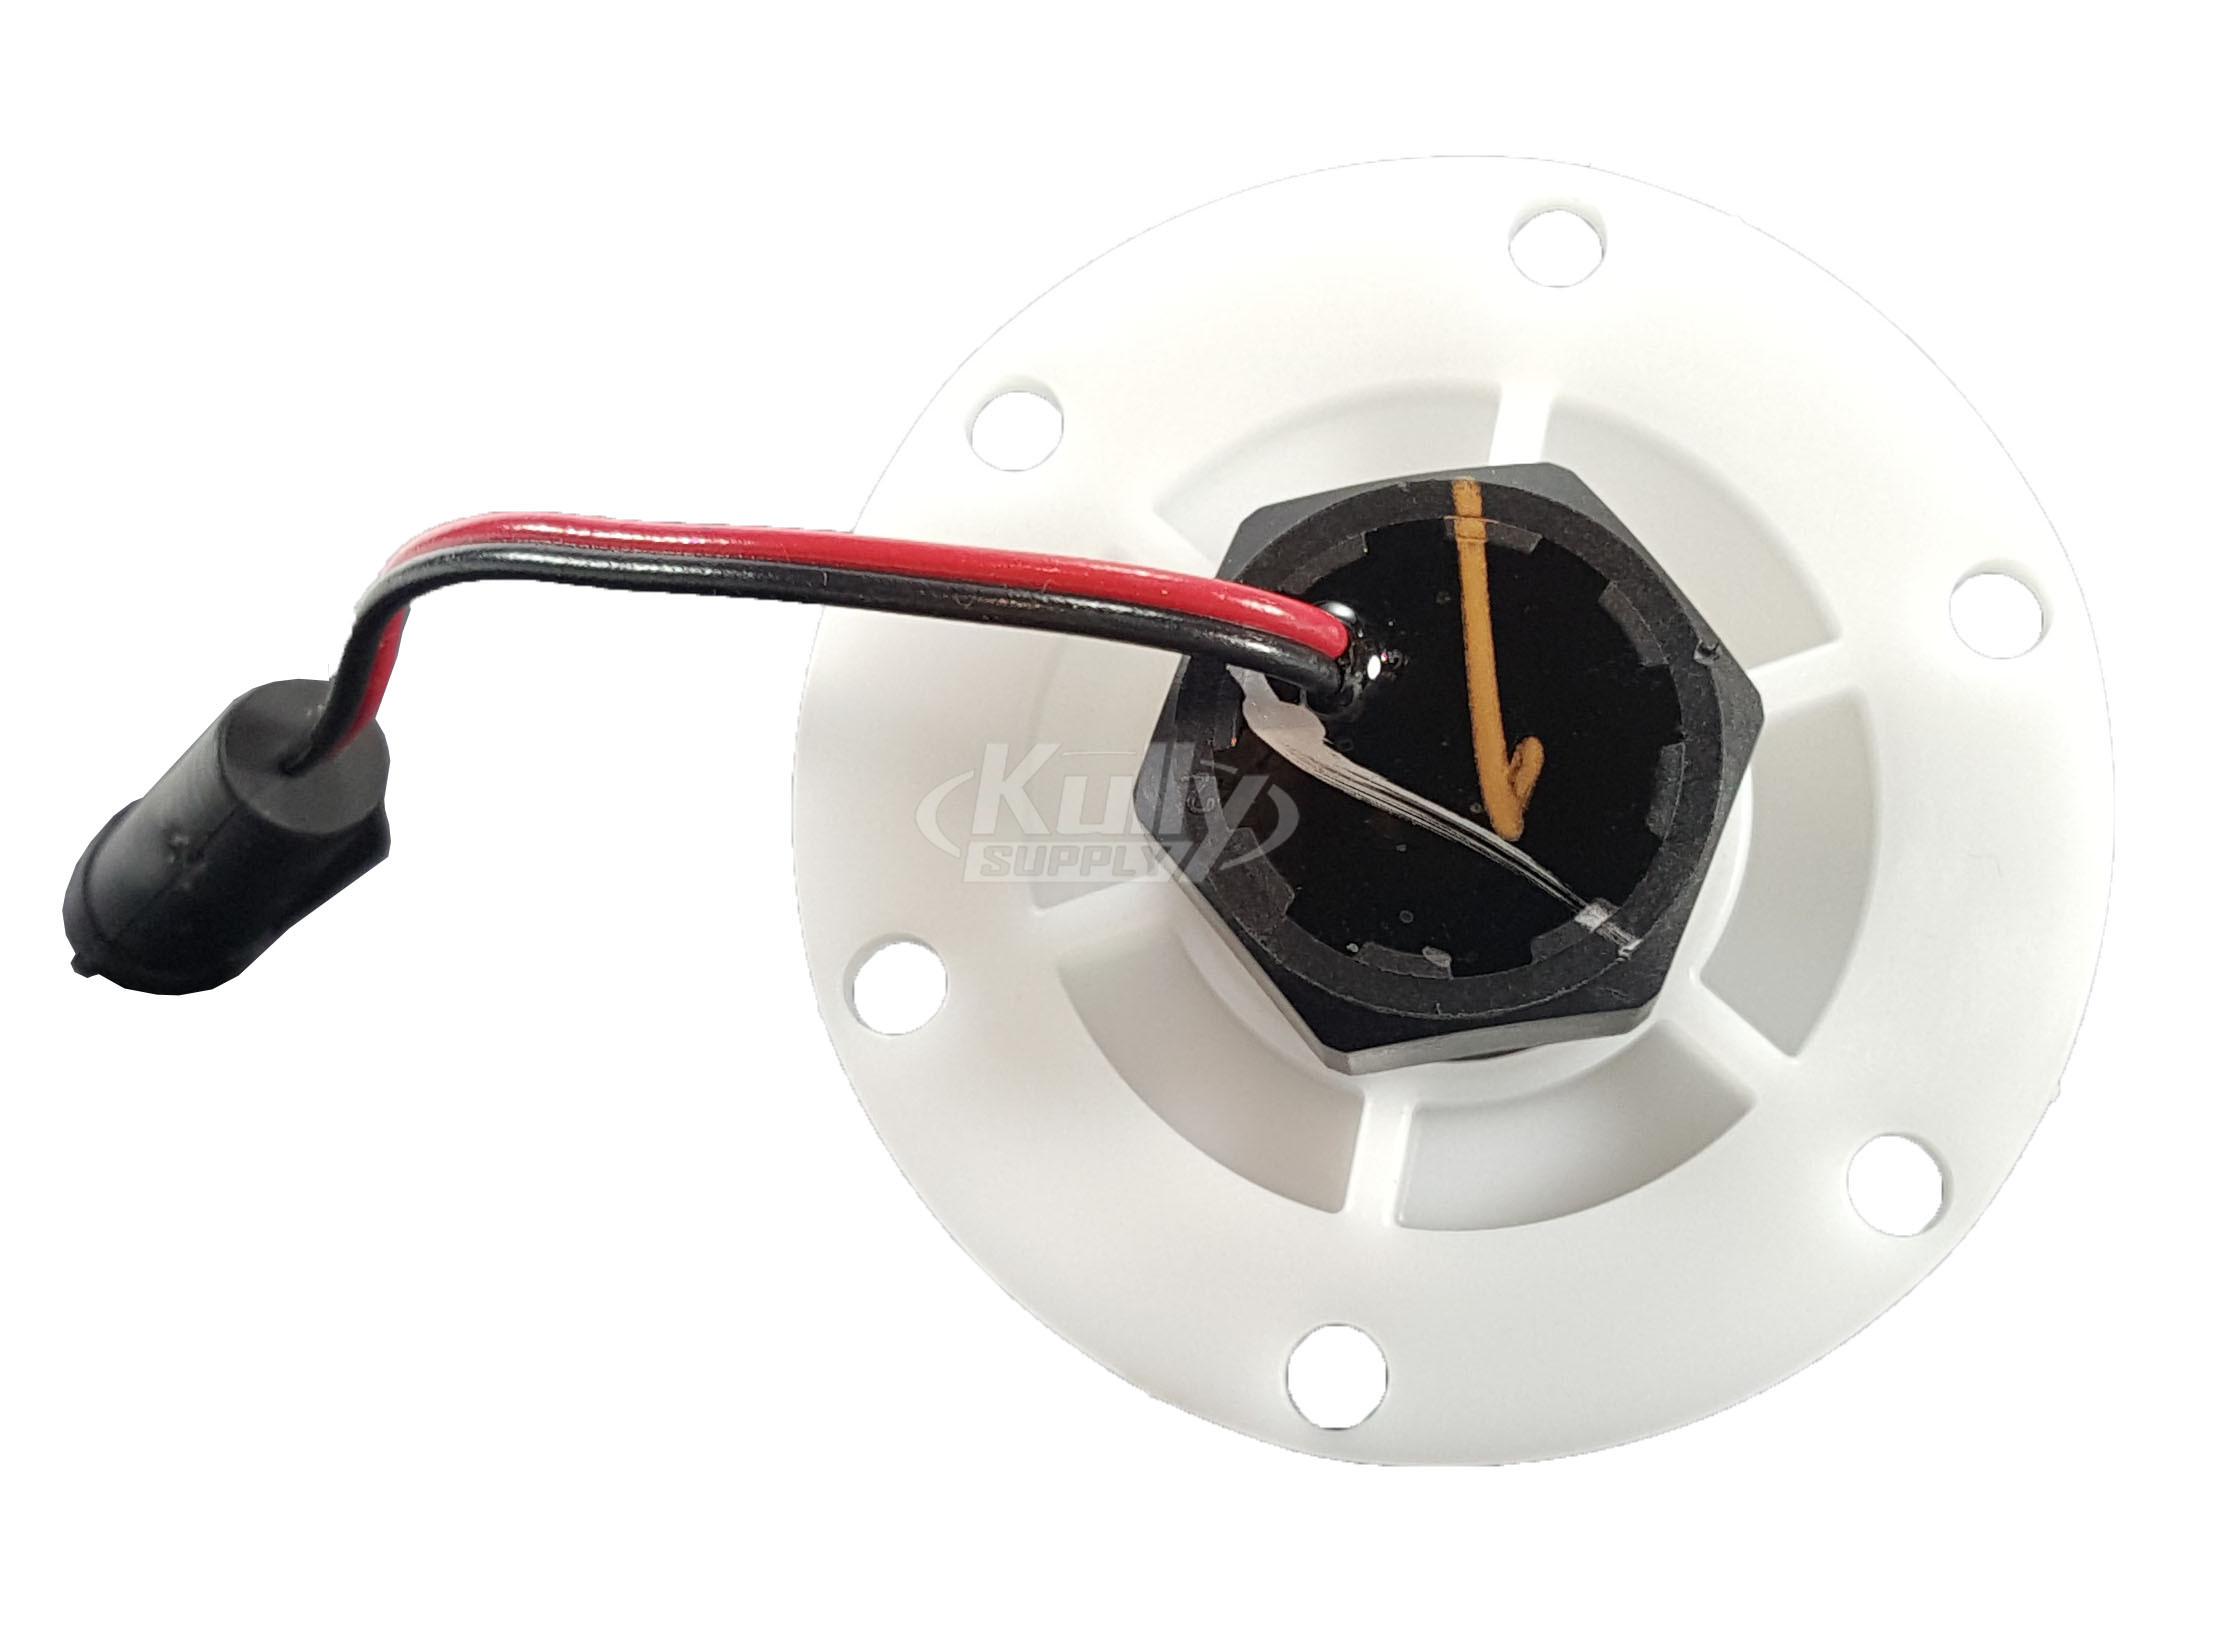 Zurn PTR6200-M Solenoid Replacement Kit